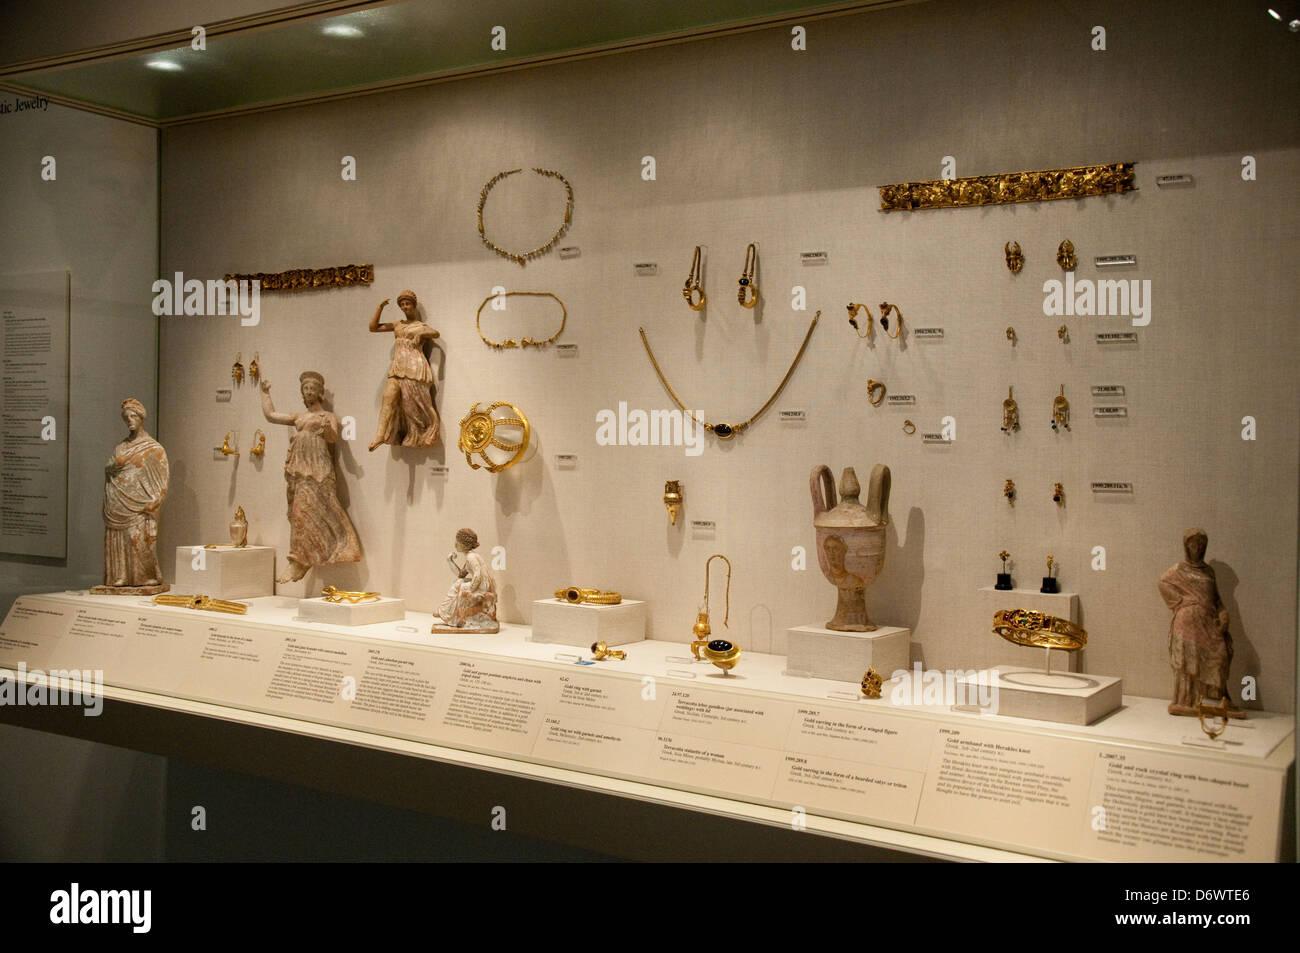 The Greek and Roman Art Gallery in the Metropolitan Museum of Art, (Met) New York City USA Stock Photo